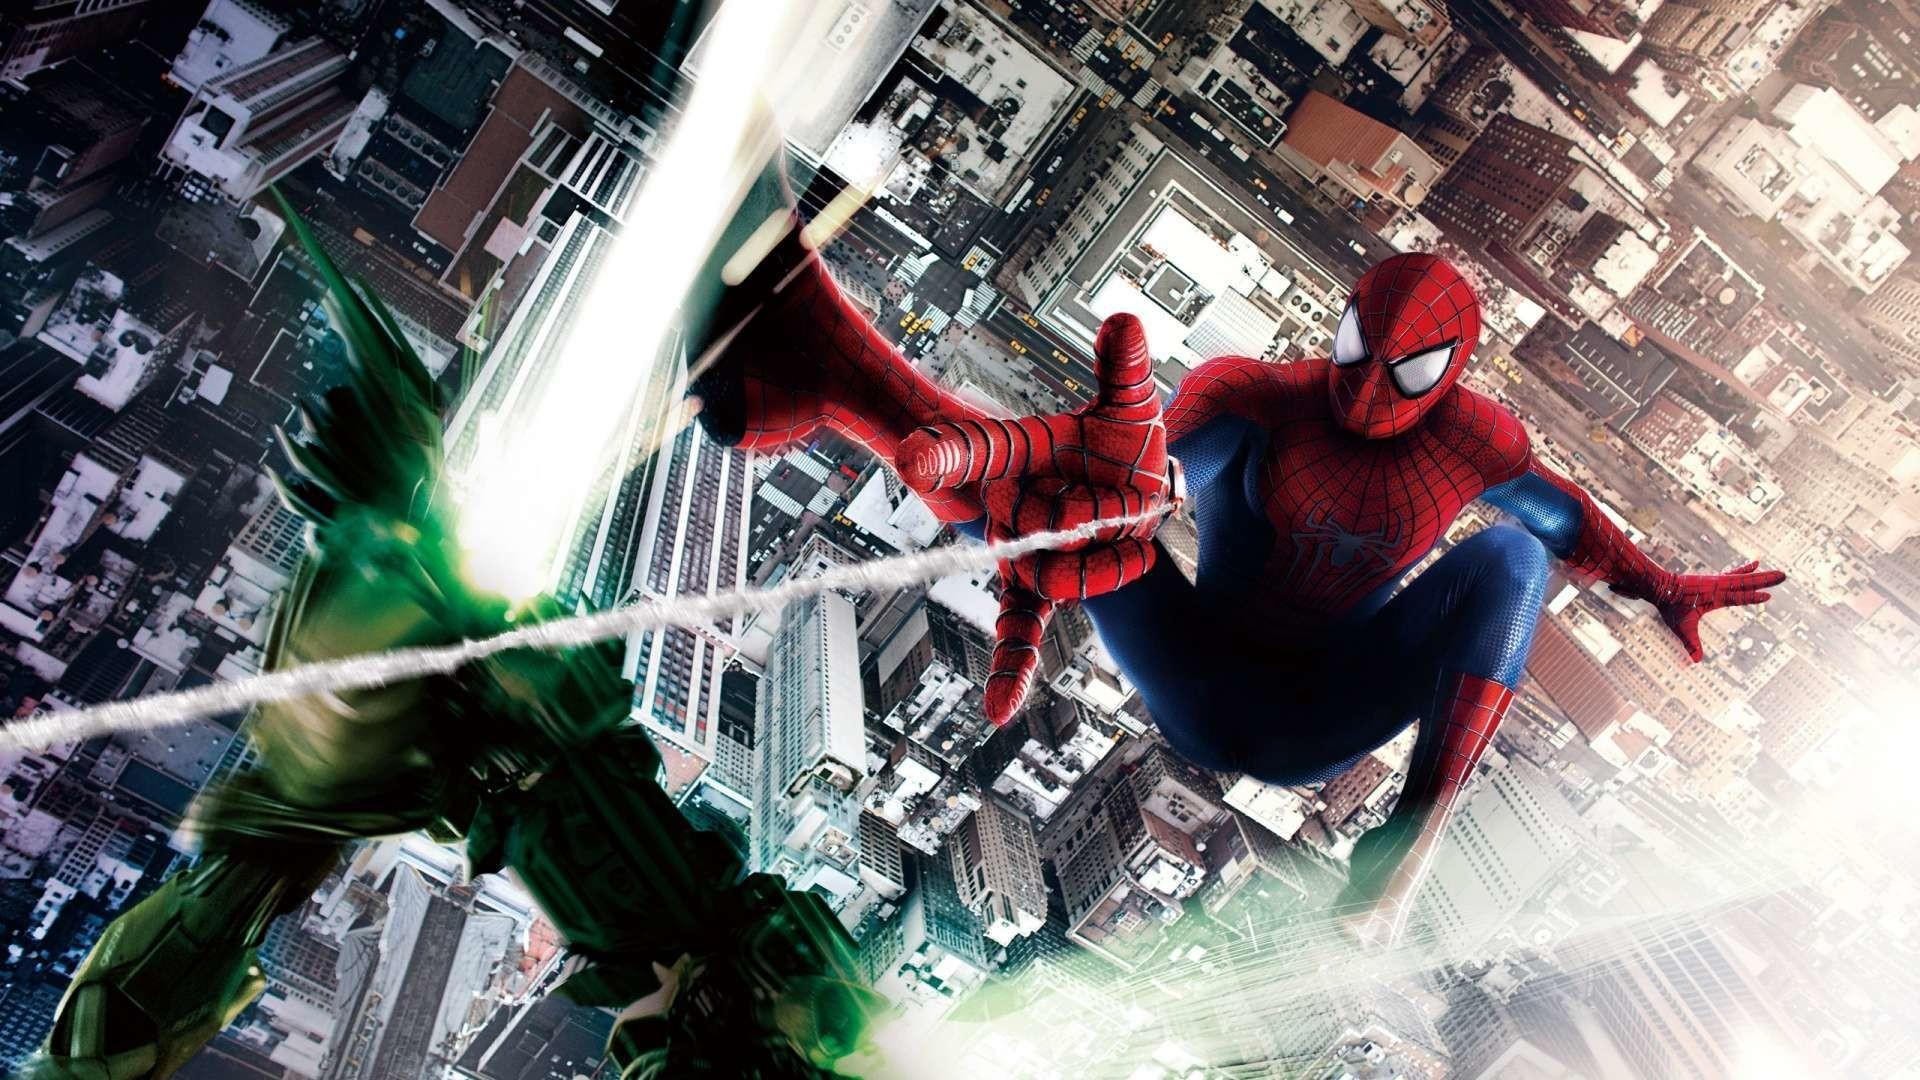 Wallpaper: Hd Wallpaper The Amazing Spider Man 2 Imax 1080p. Upload at .